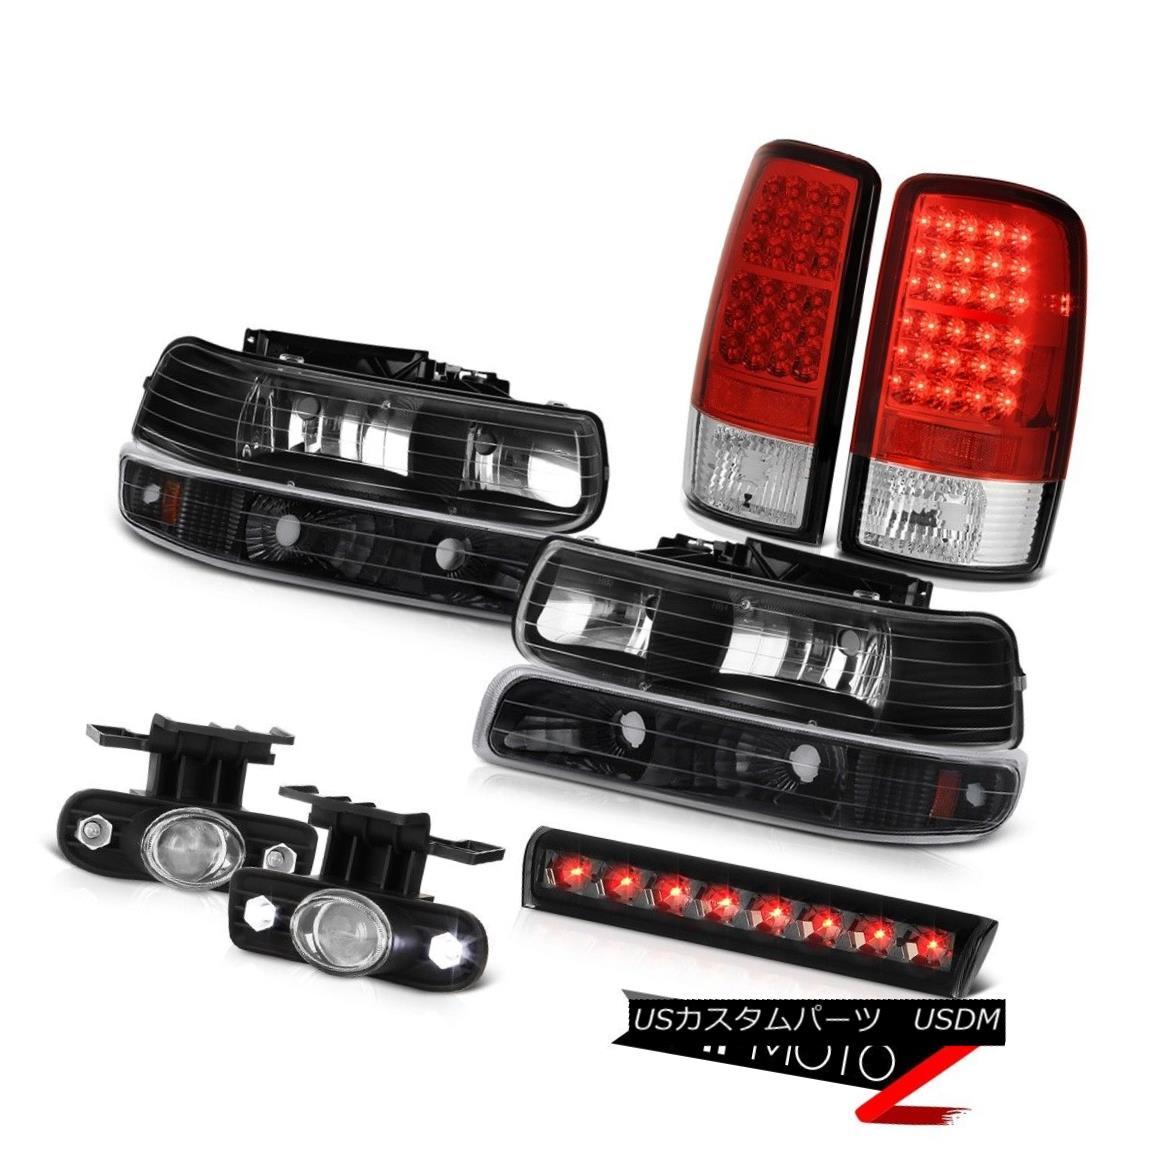 Nuovo Vans Nero Scarpe Iso 1.5 Per Donna, Vans Italia 0718